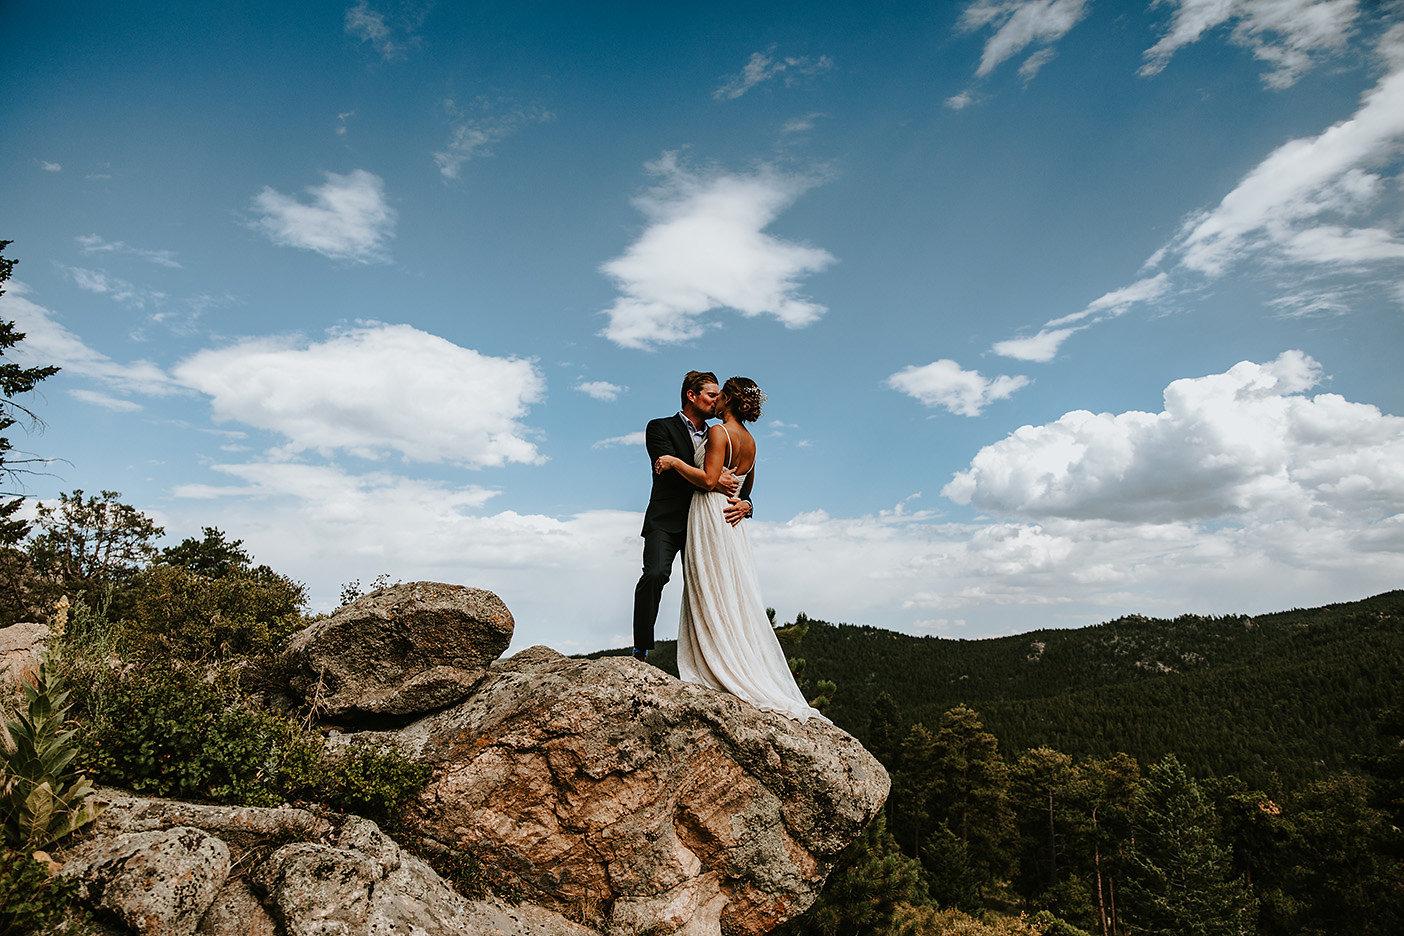 Nederland, Colorado Wedding Photography